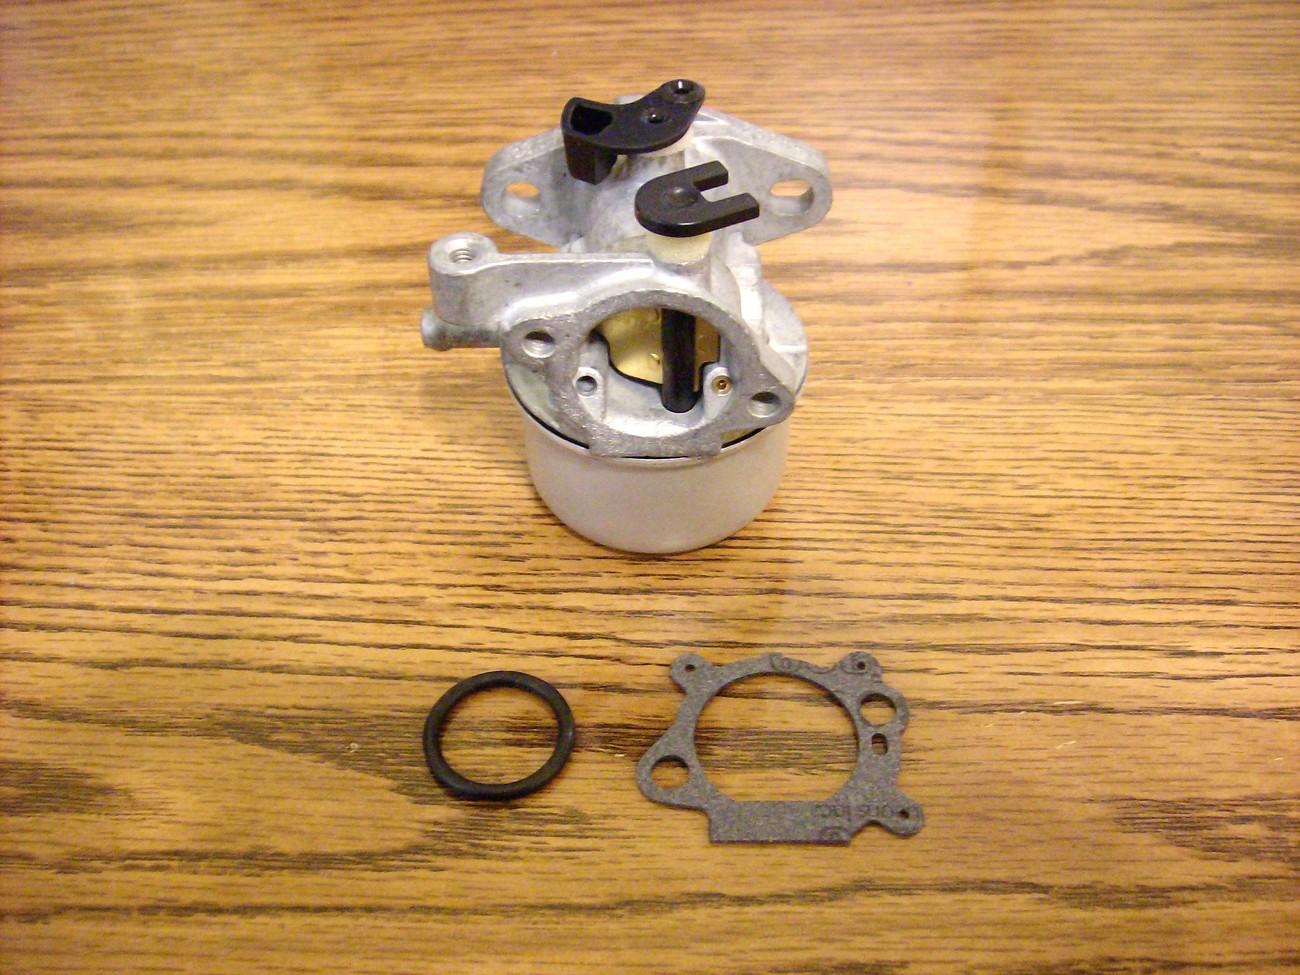 Briggs & Stratton carb carburetor with auto choke 790845